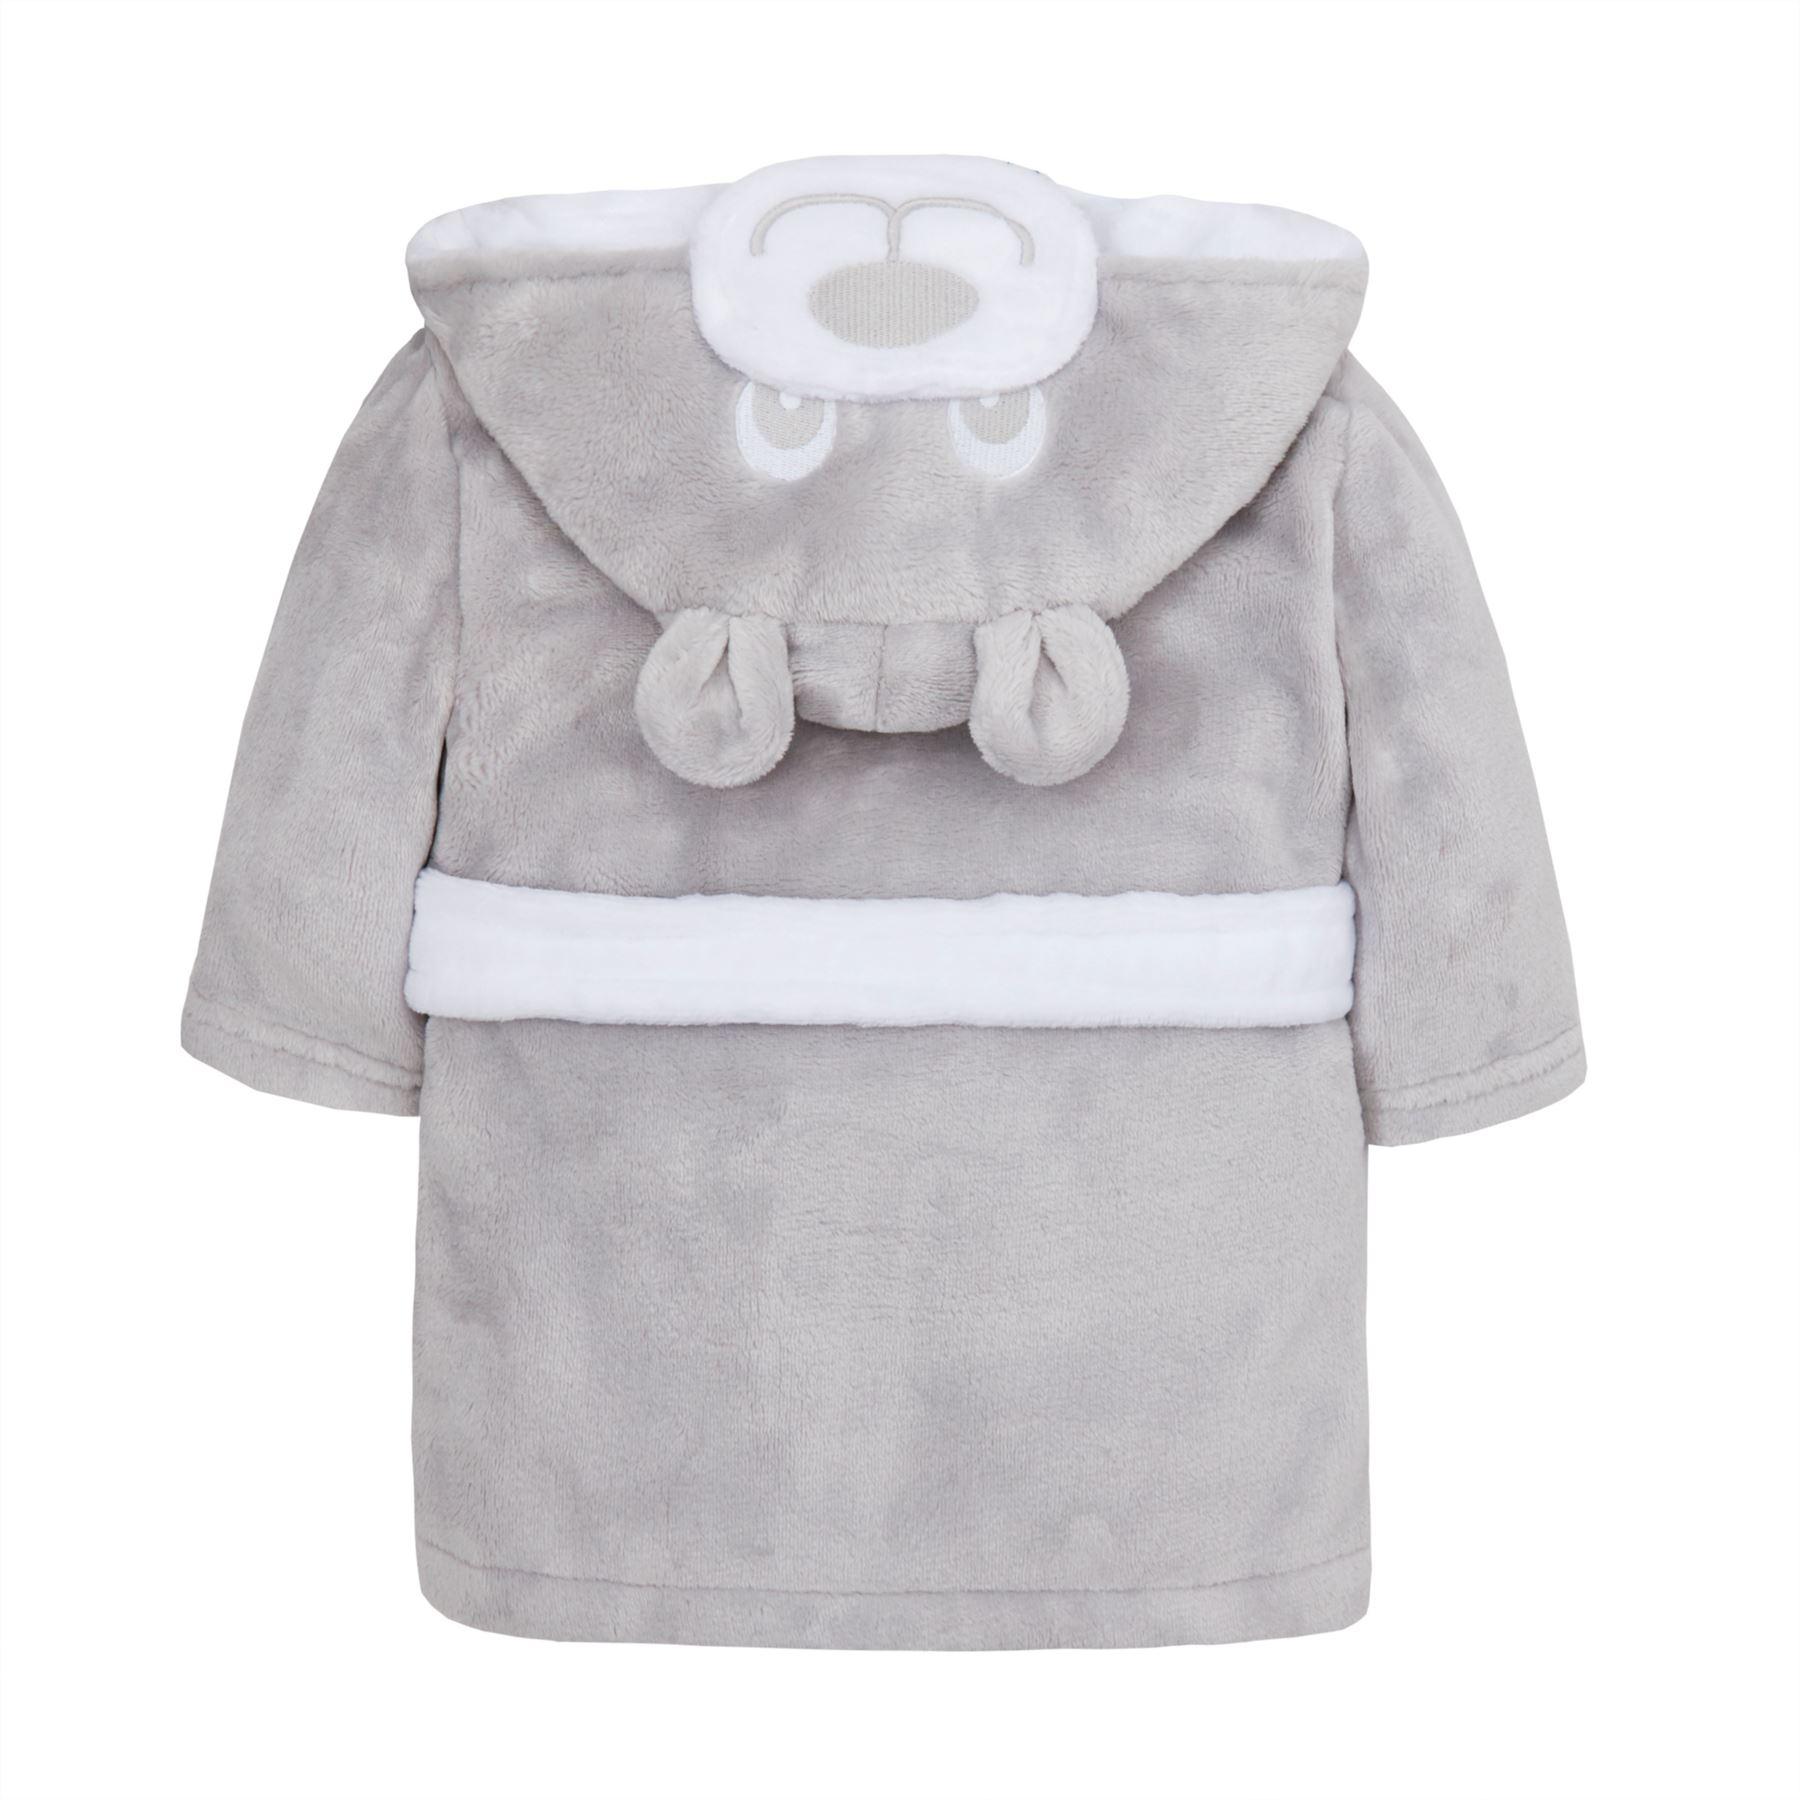 Baby Dressing Gown Robe Toddler 6-24 M Hooded Fleece Duck Elephant Novelty